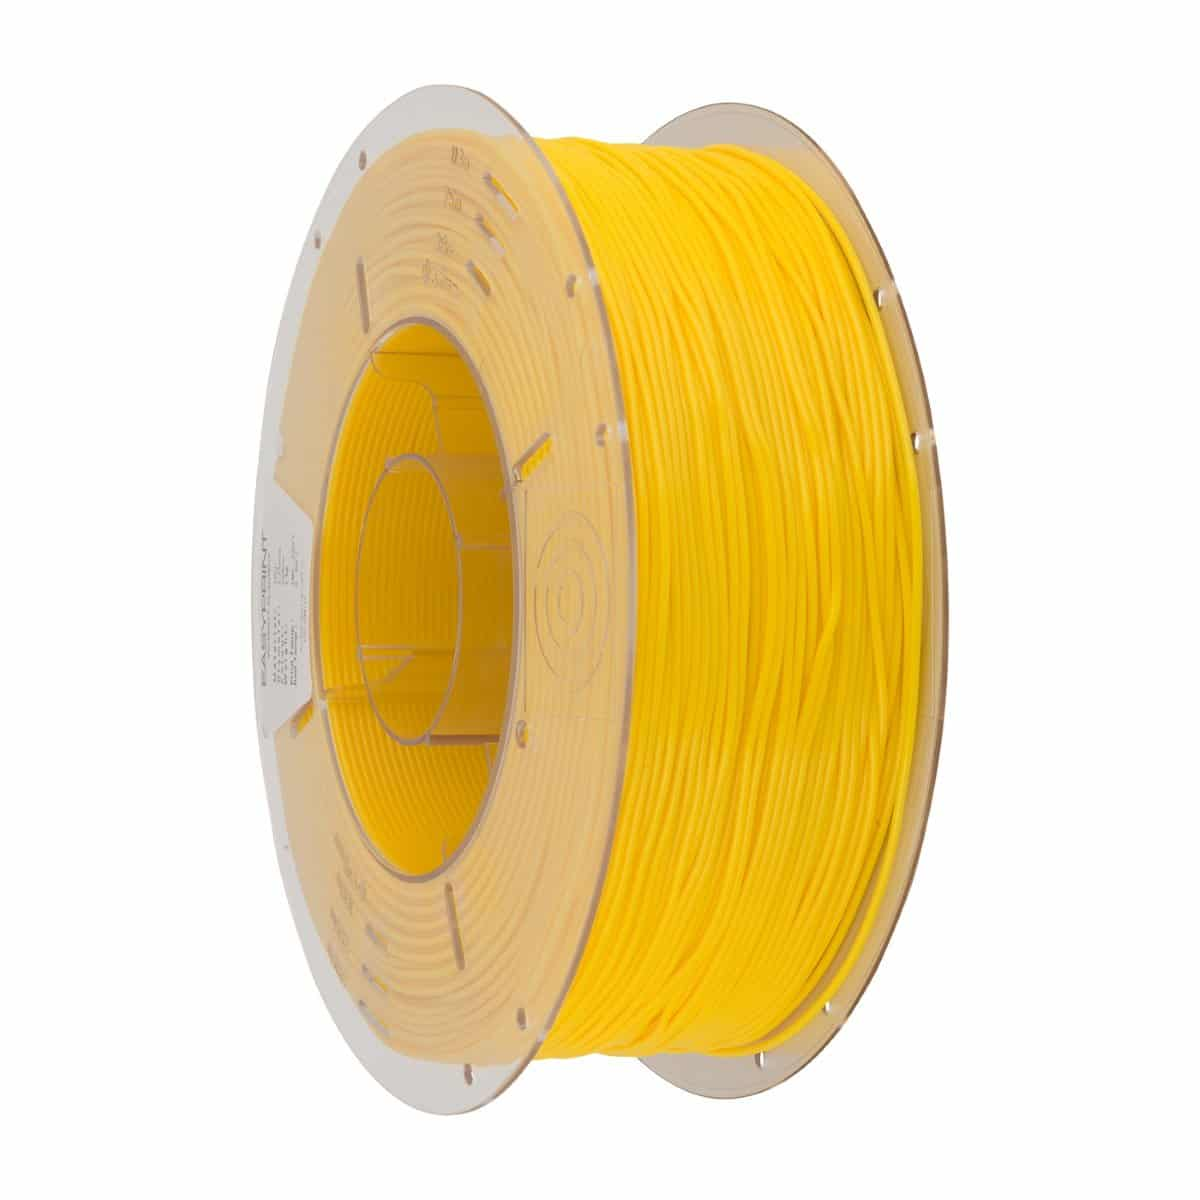 Image of PrimaCreator™ EasyPrint FLEX 95A - 1.75mm - 1 kg - Yellow